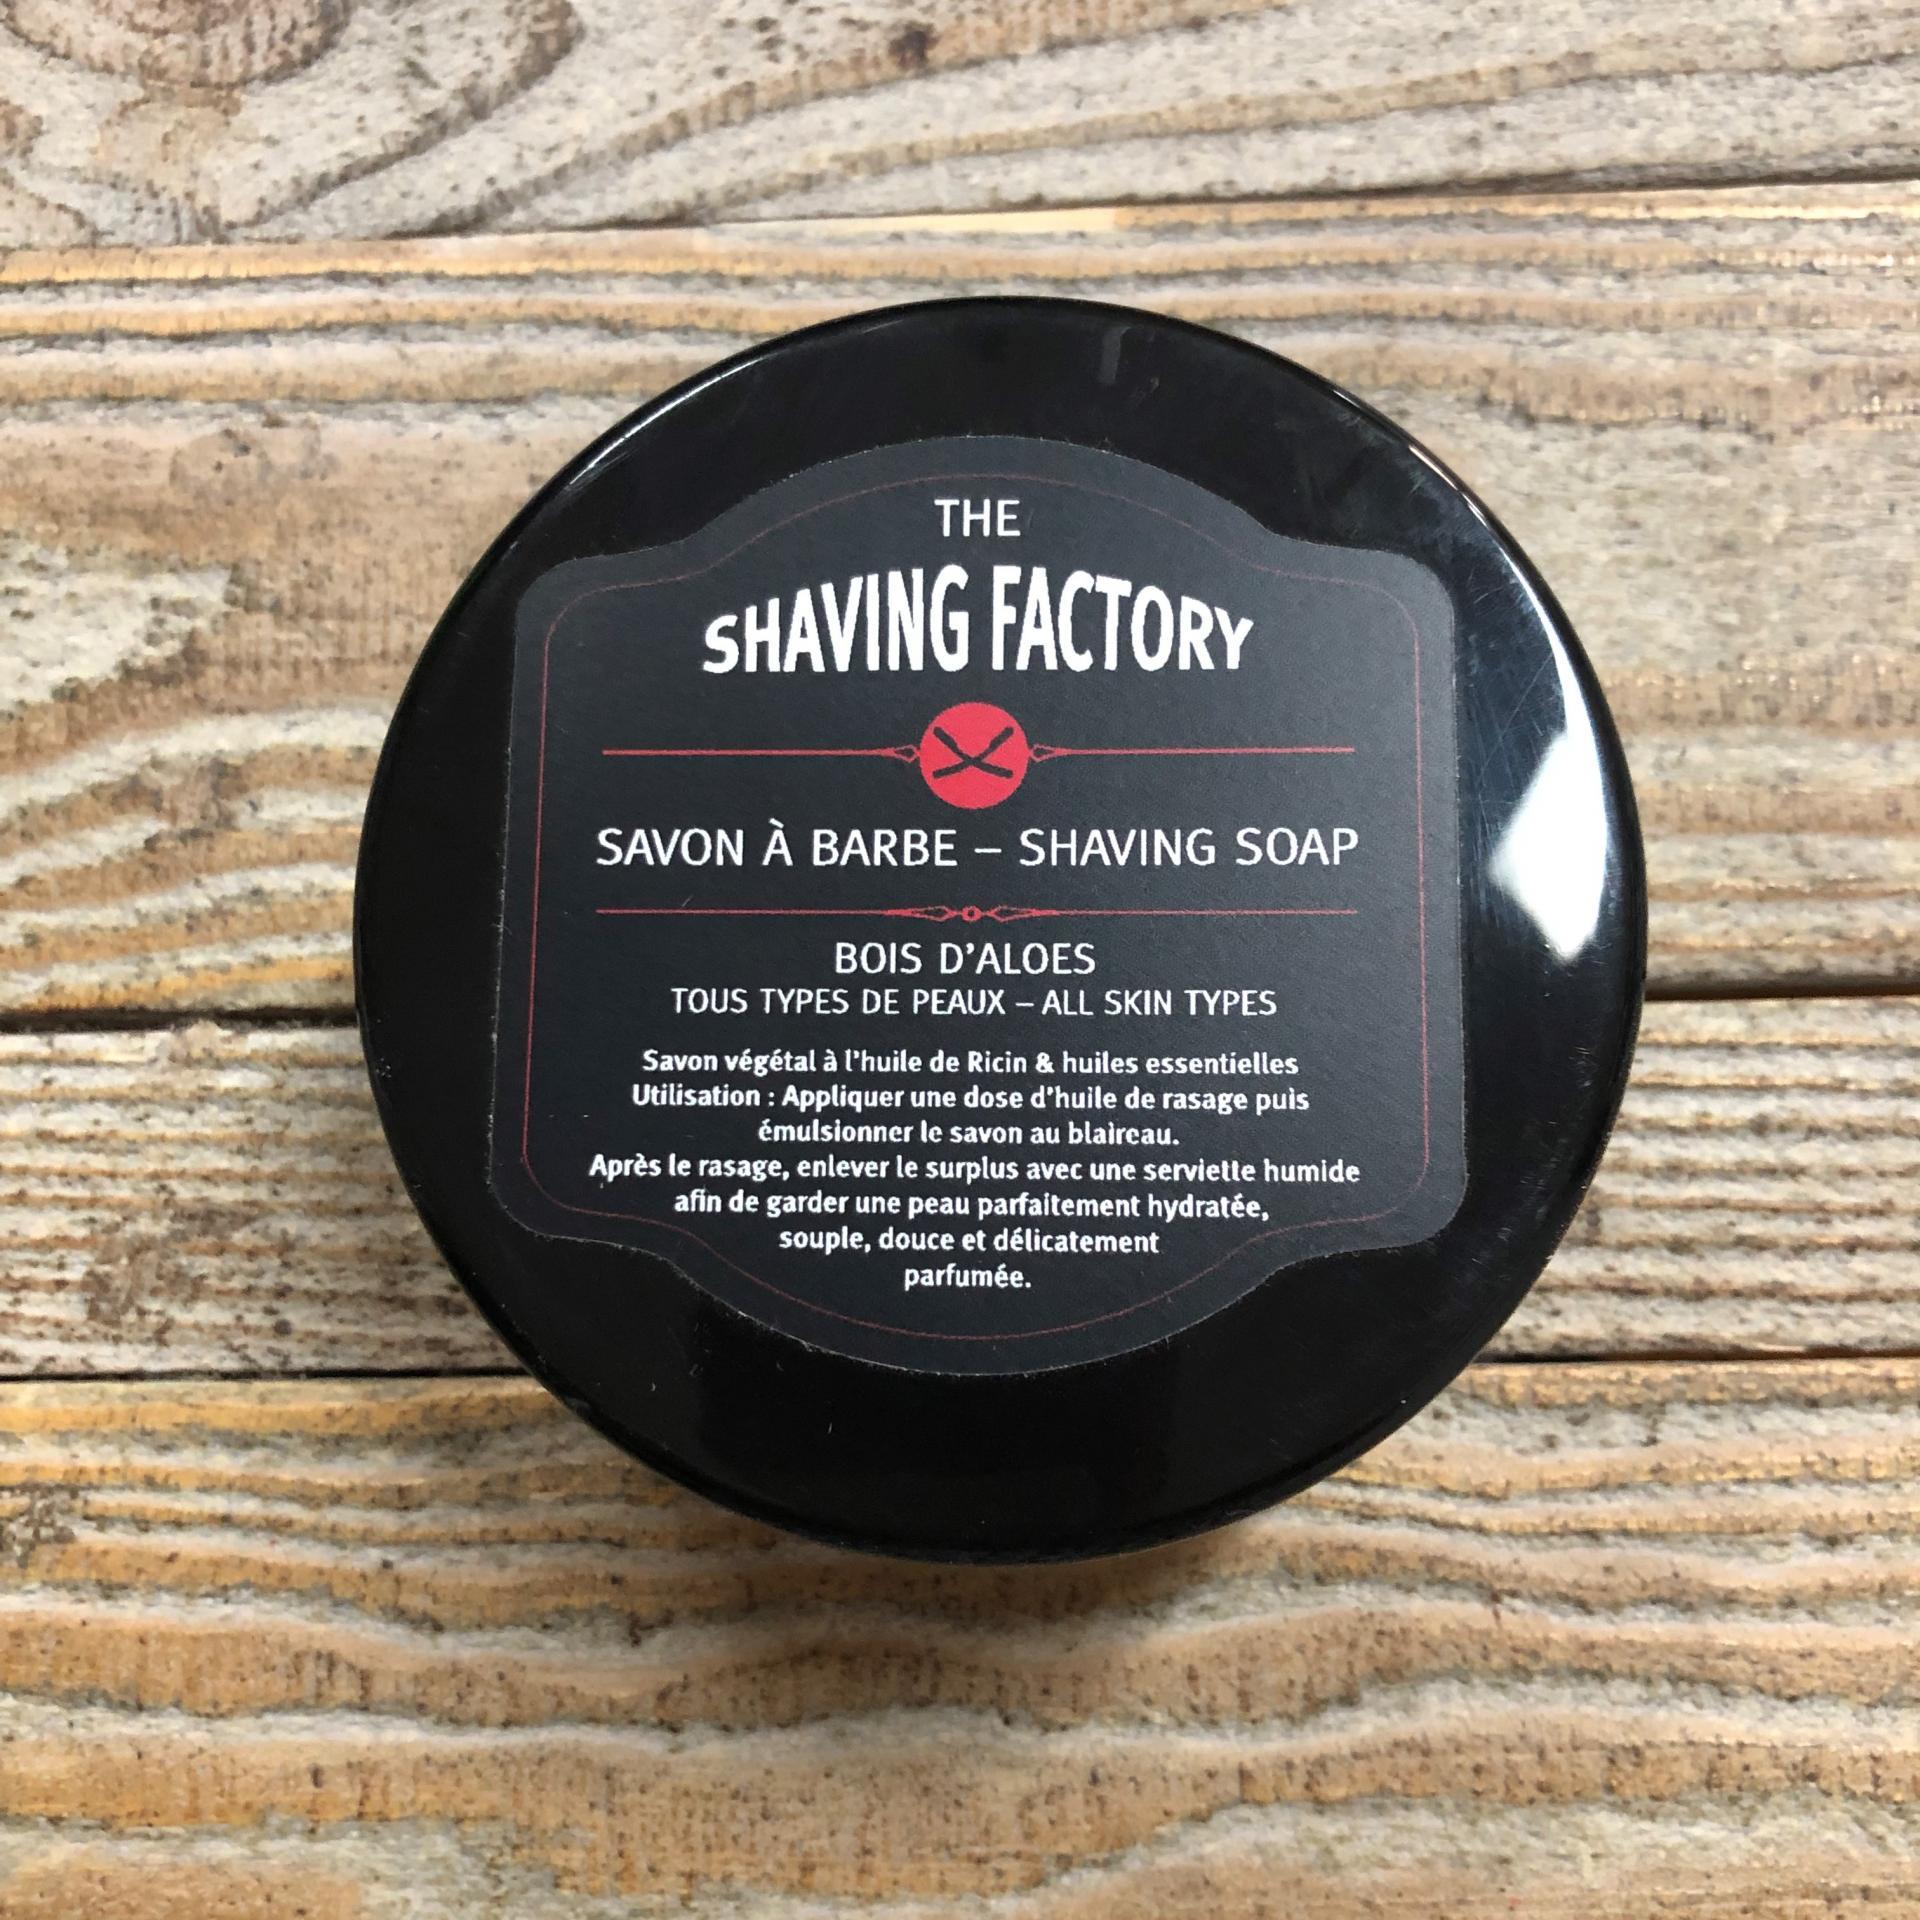 Savon a barbe 1